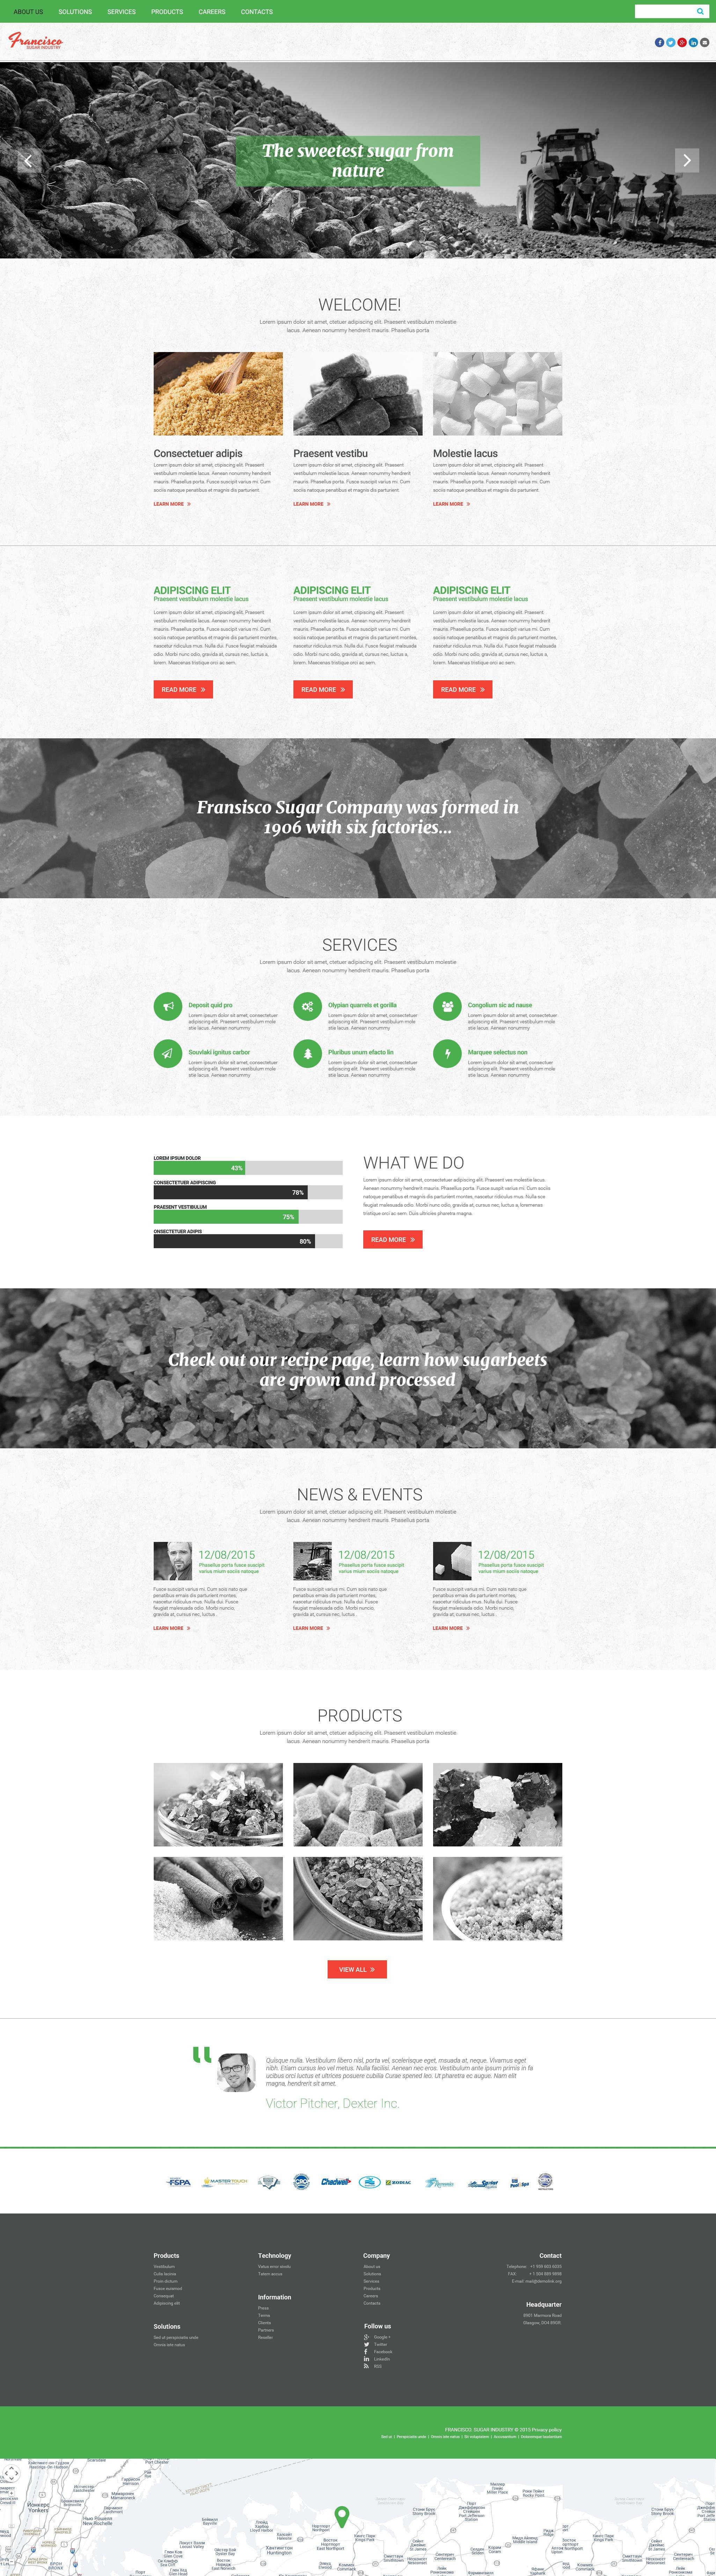 Francisco Sugar Industry Website Template - screenshot